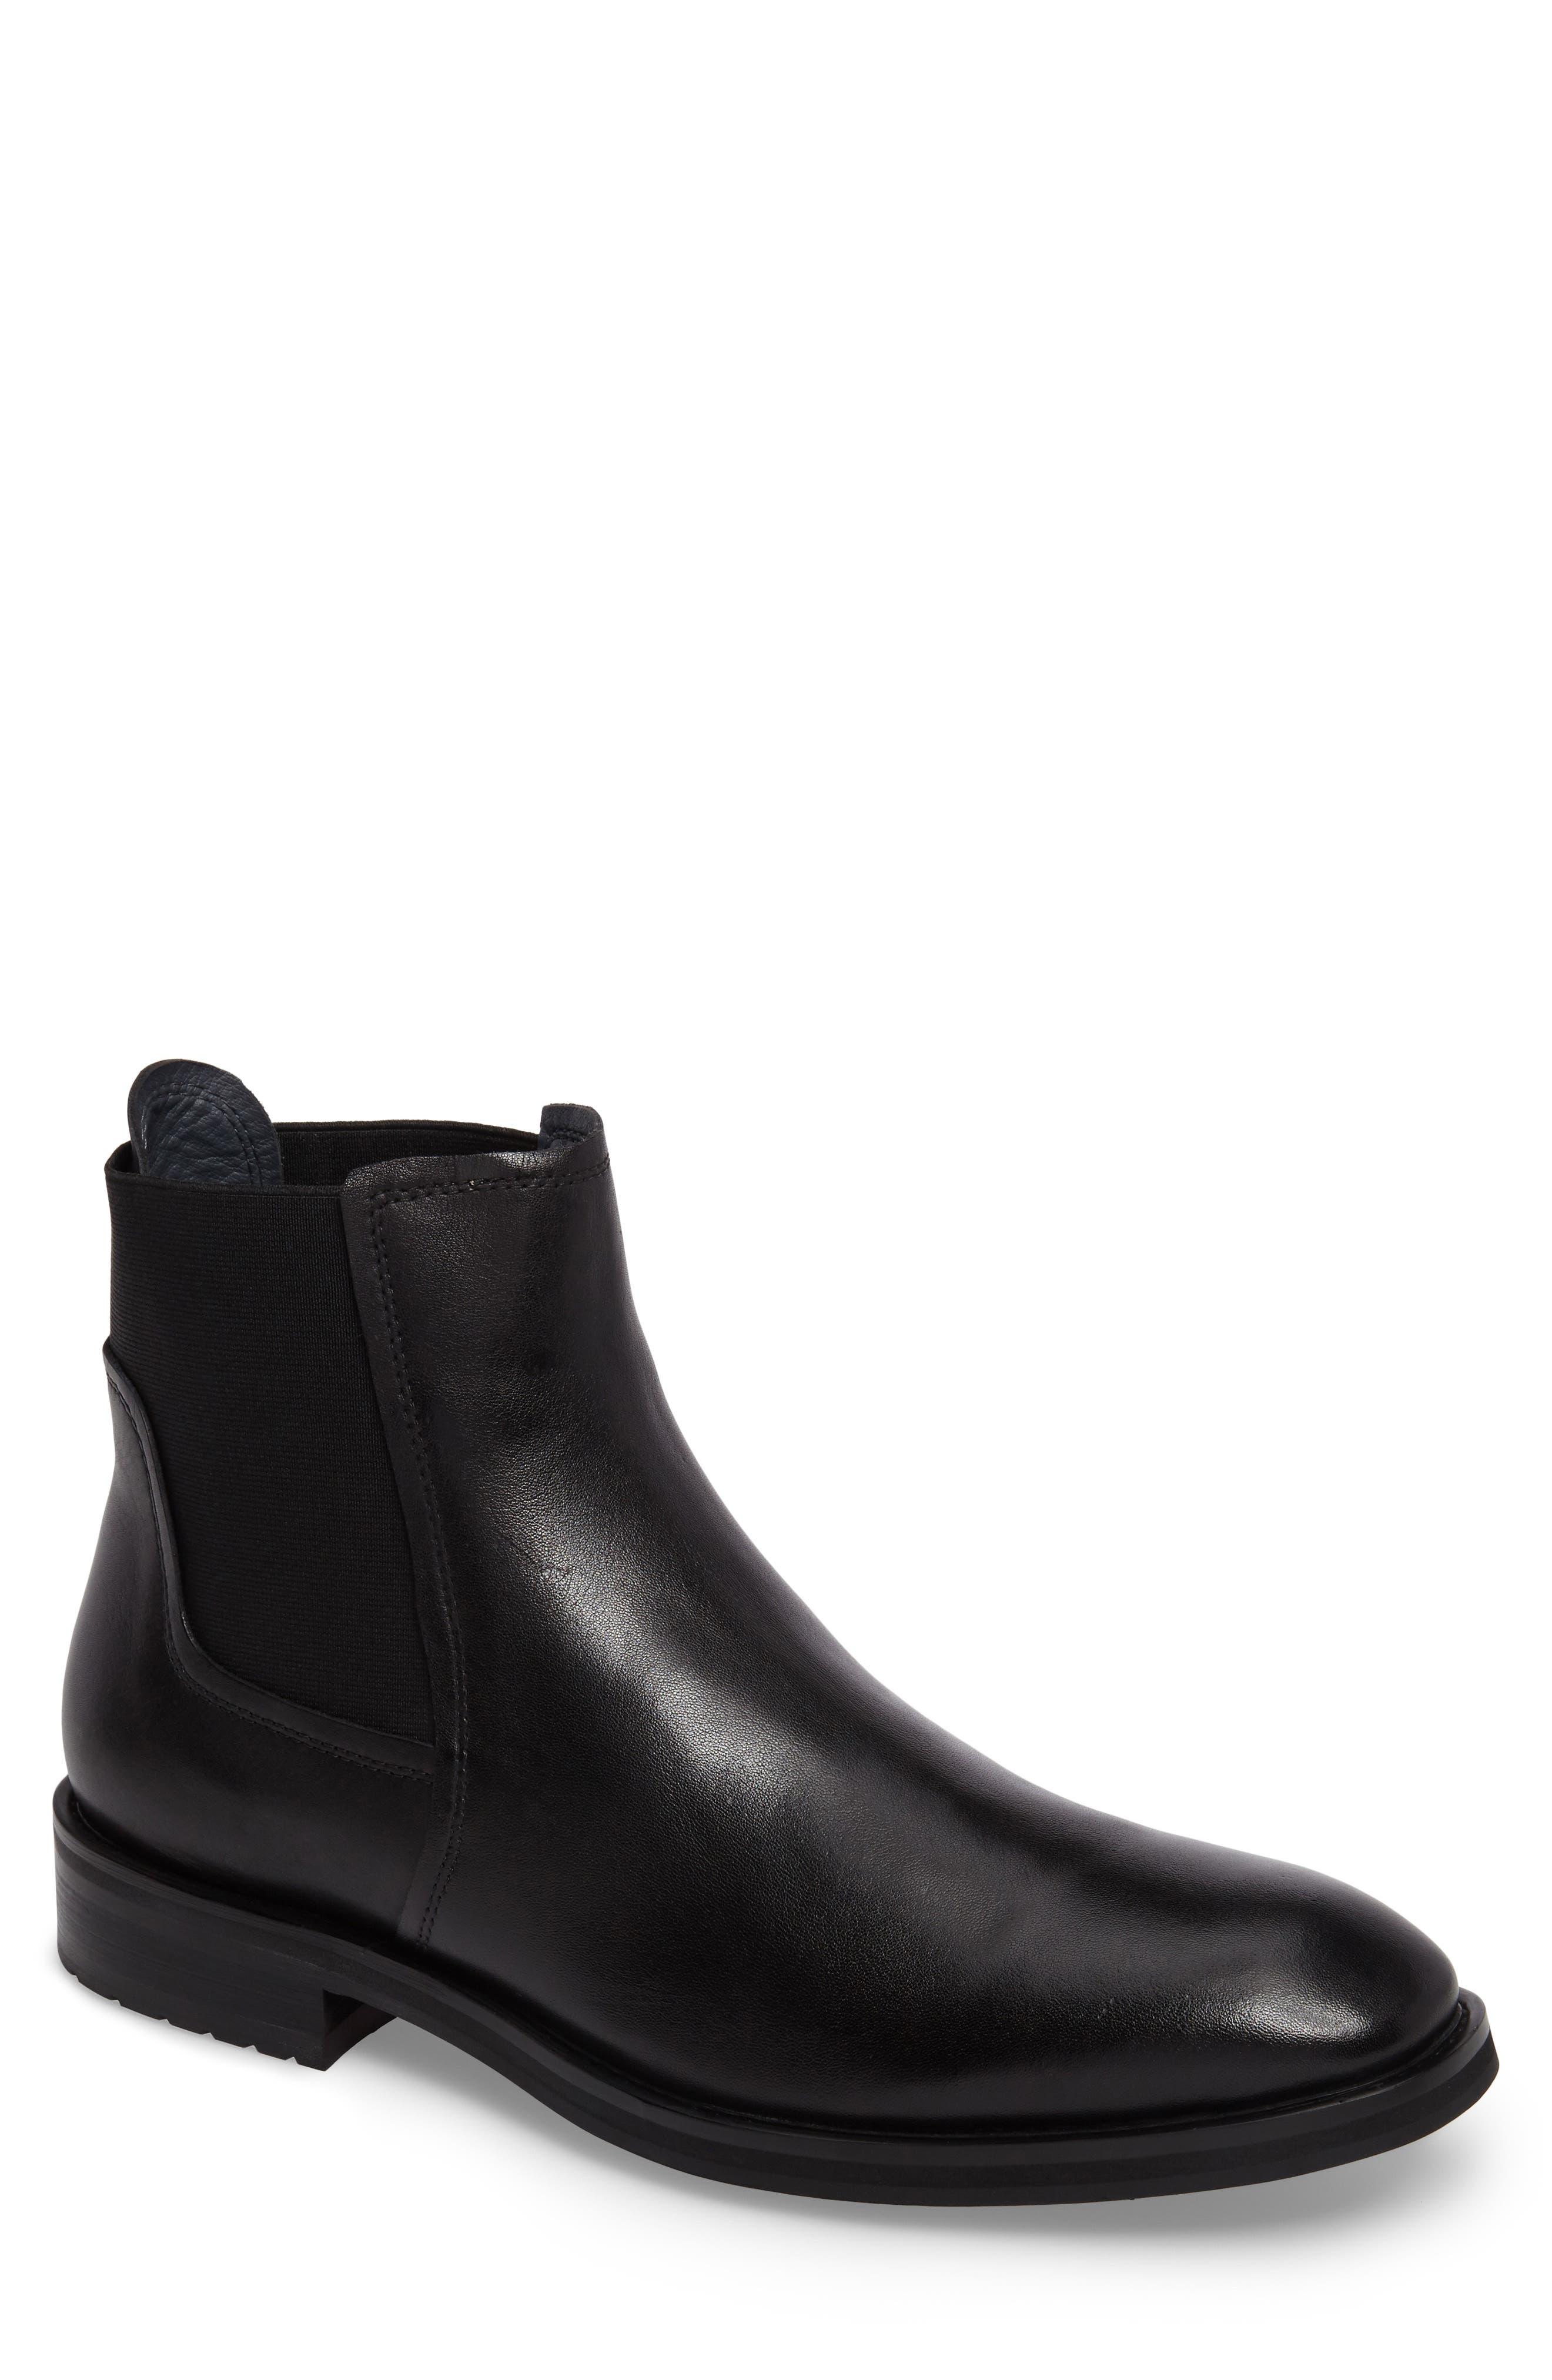 Alternate Image 1 Selected - English Laundry Belmont Chelsea Boot (Men)